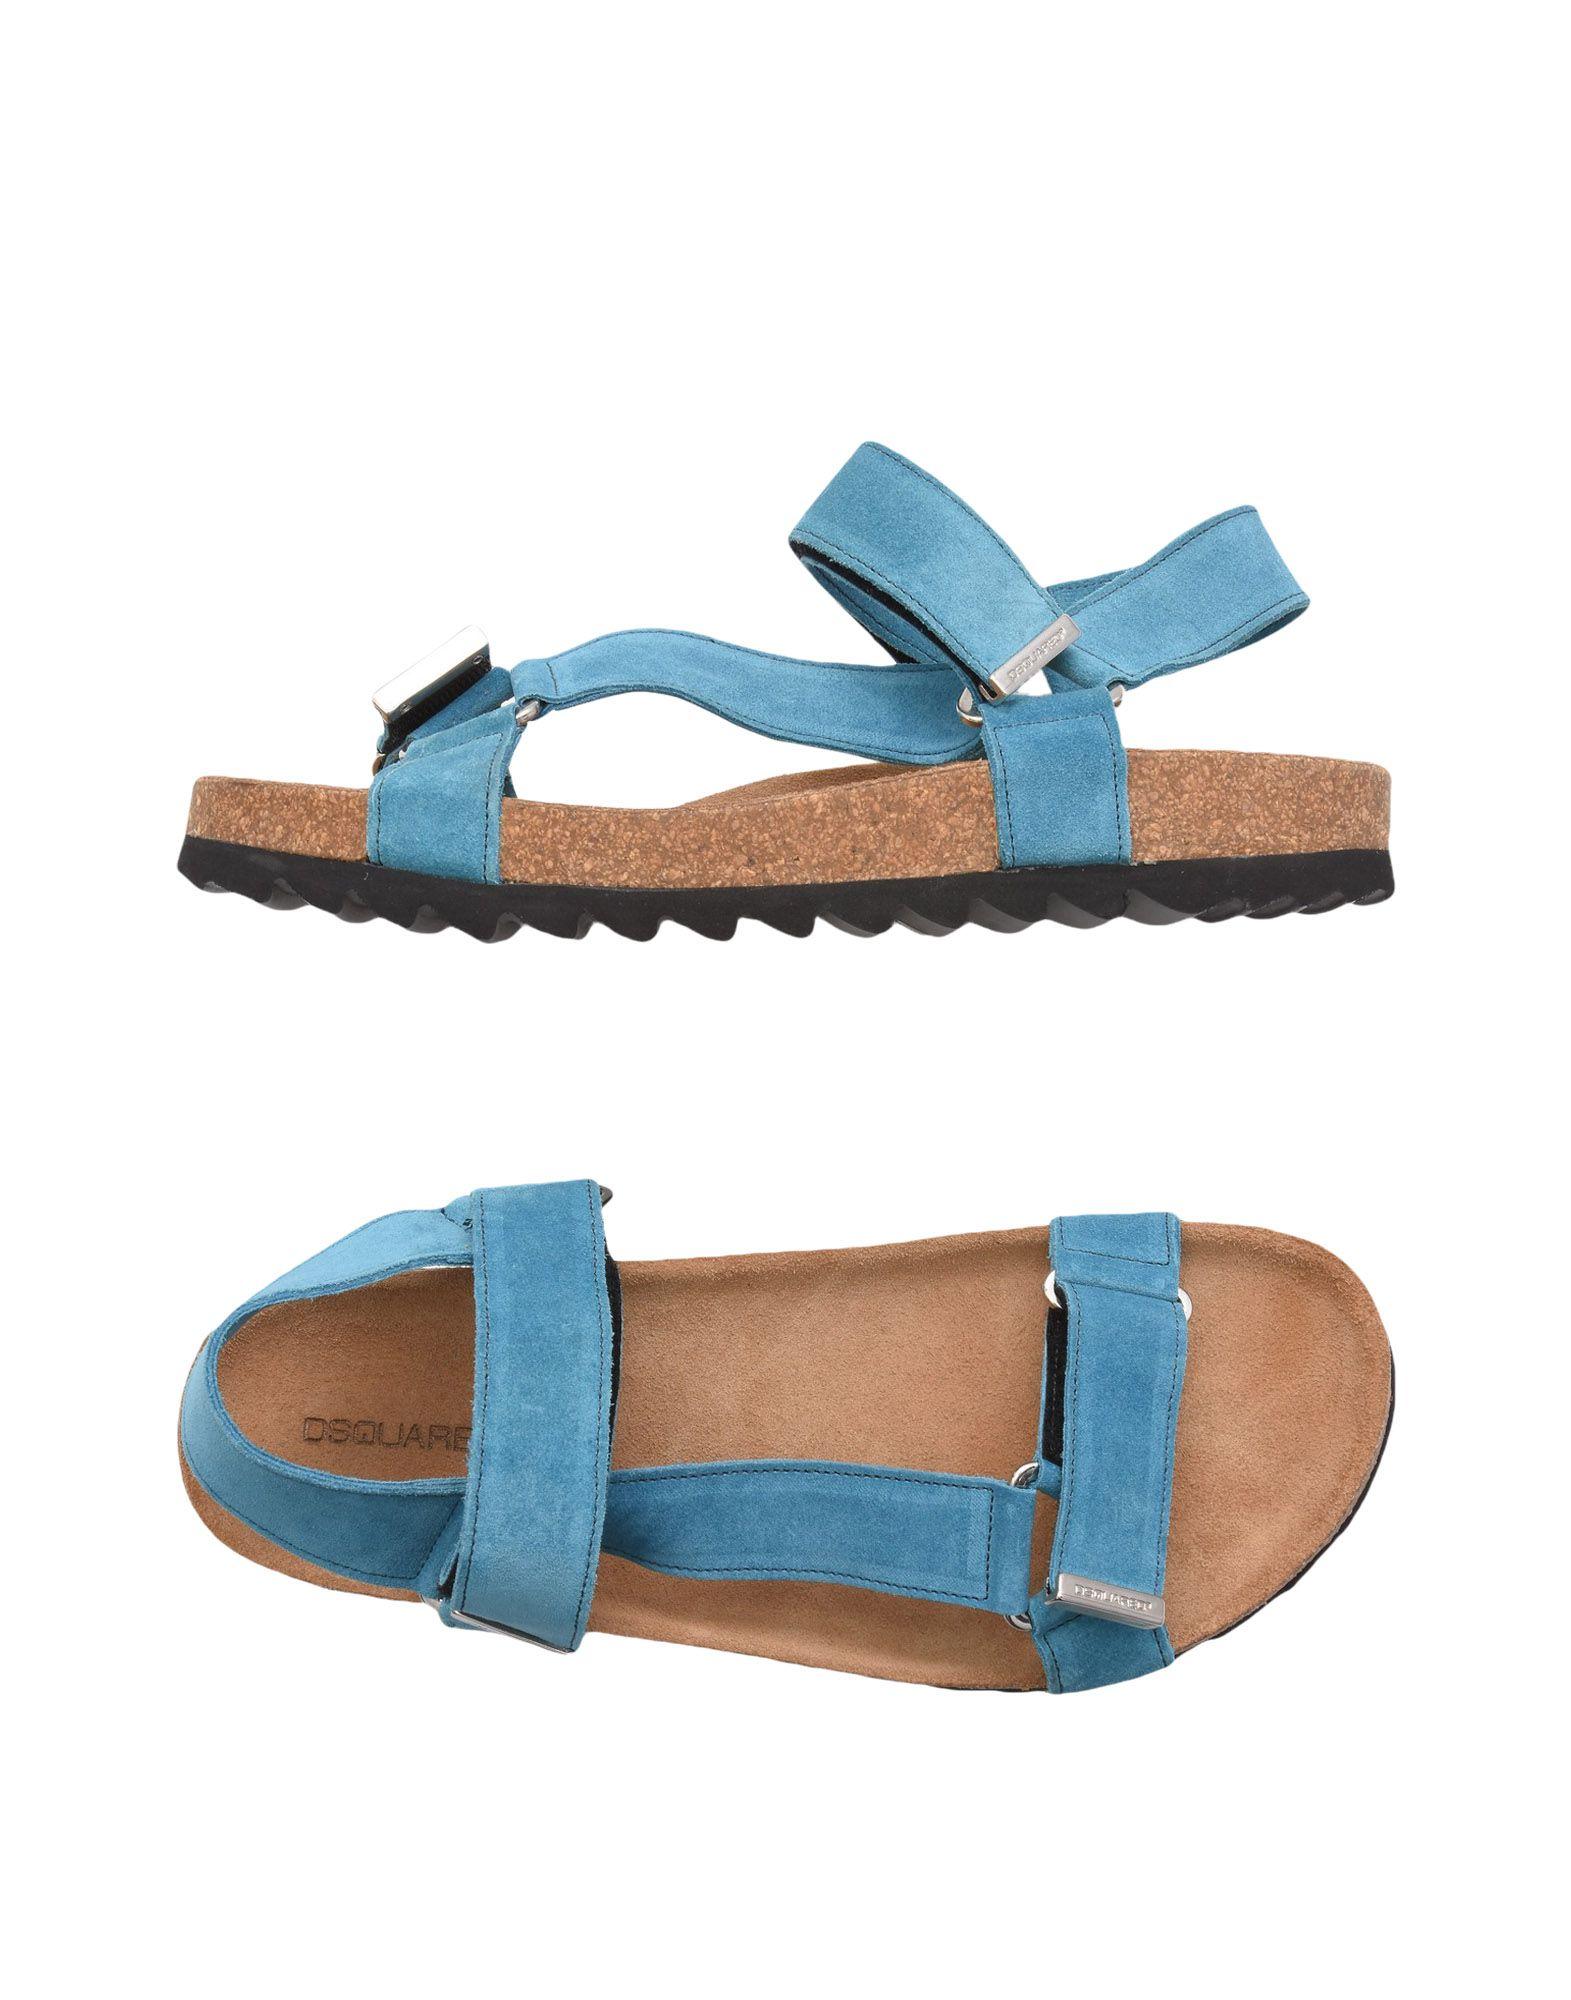 Dsquared2 Sandalen Herren  11470013AI Gute Qualität beliebte Schuhe